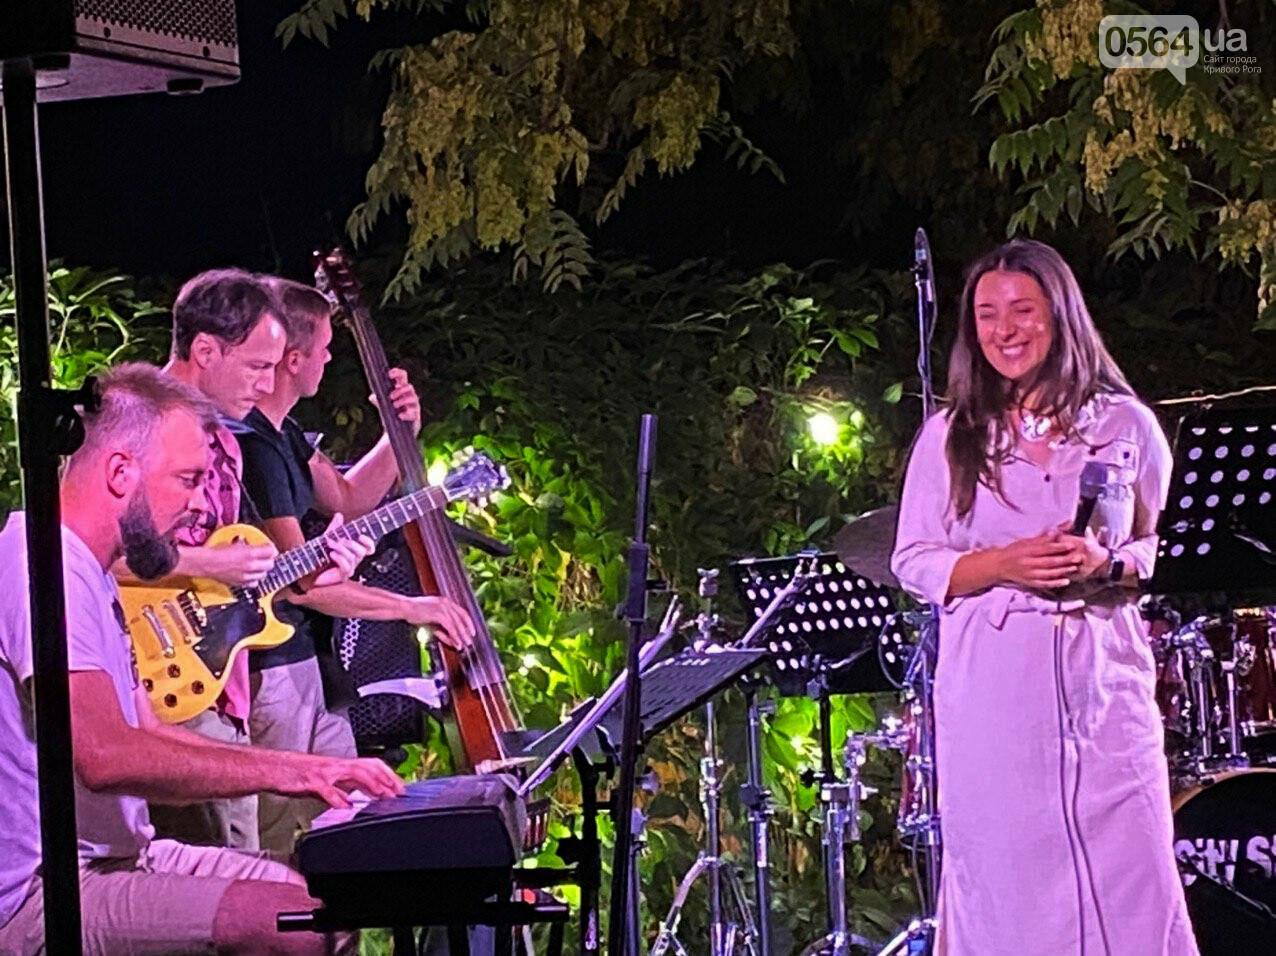 Под звездным небом криворожане наслаждались летним джазом от  Advantage Project, - ФОТО, ВИДЕО , фото-62